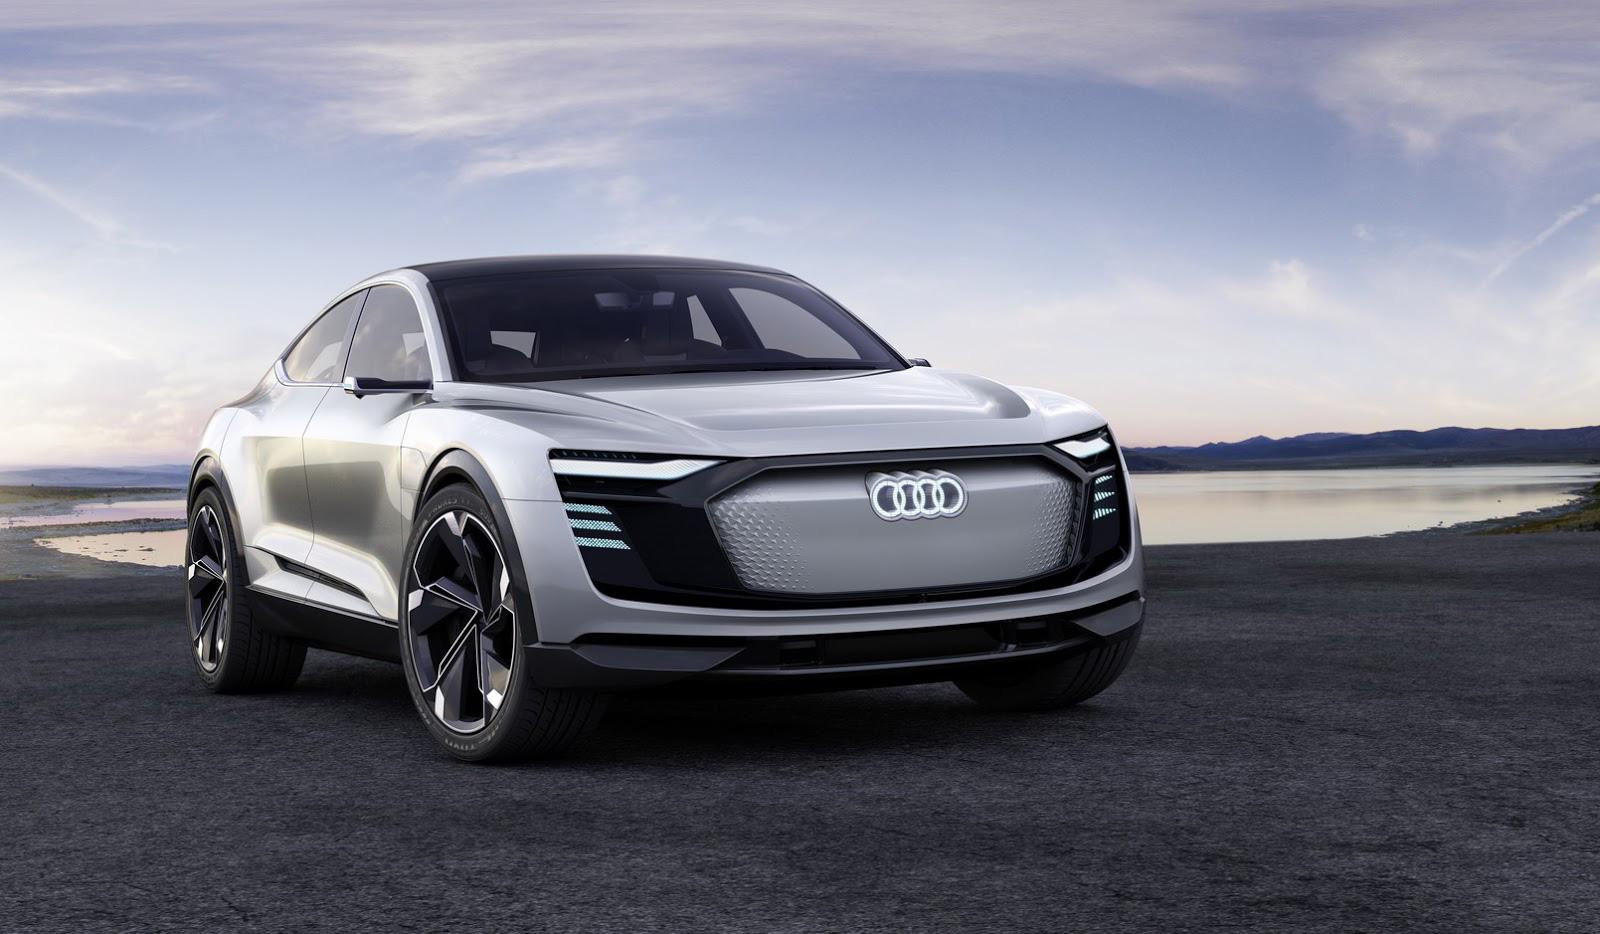 Audi E-Tron Sportsback